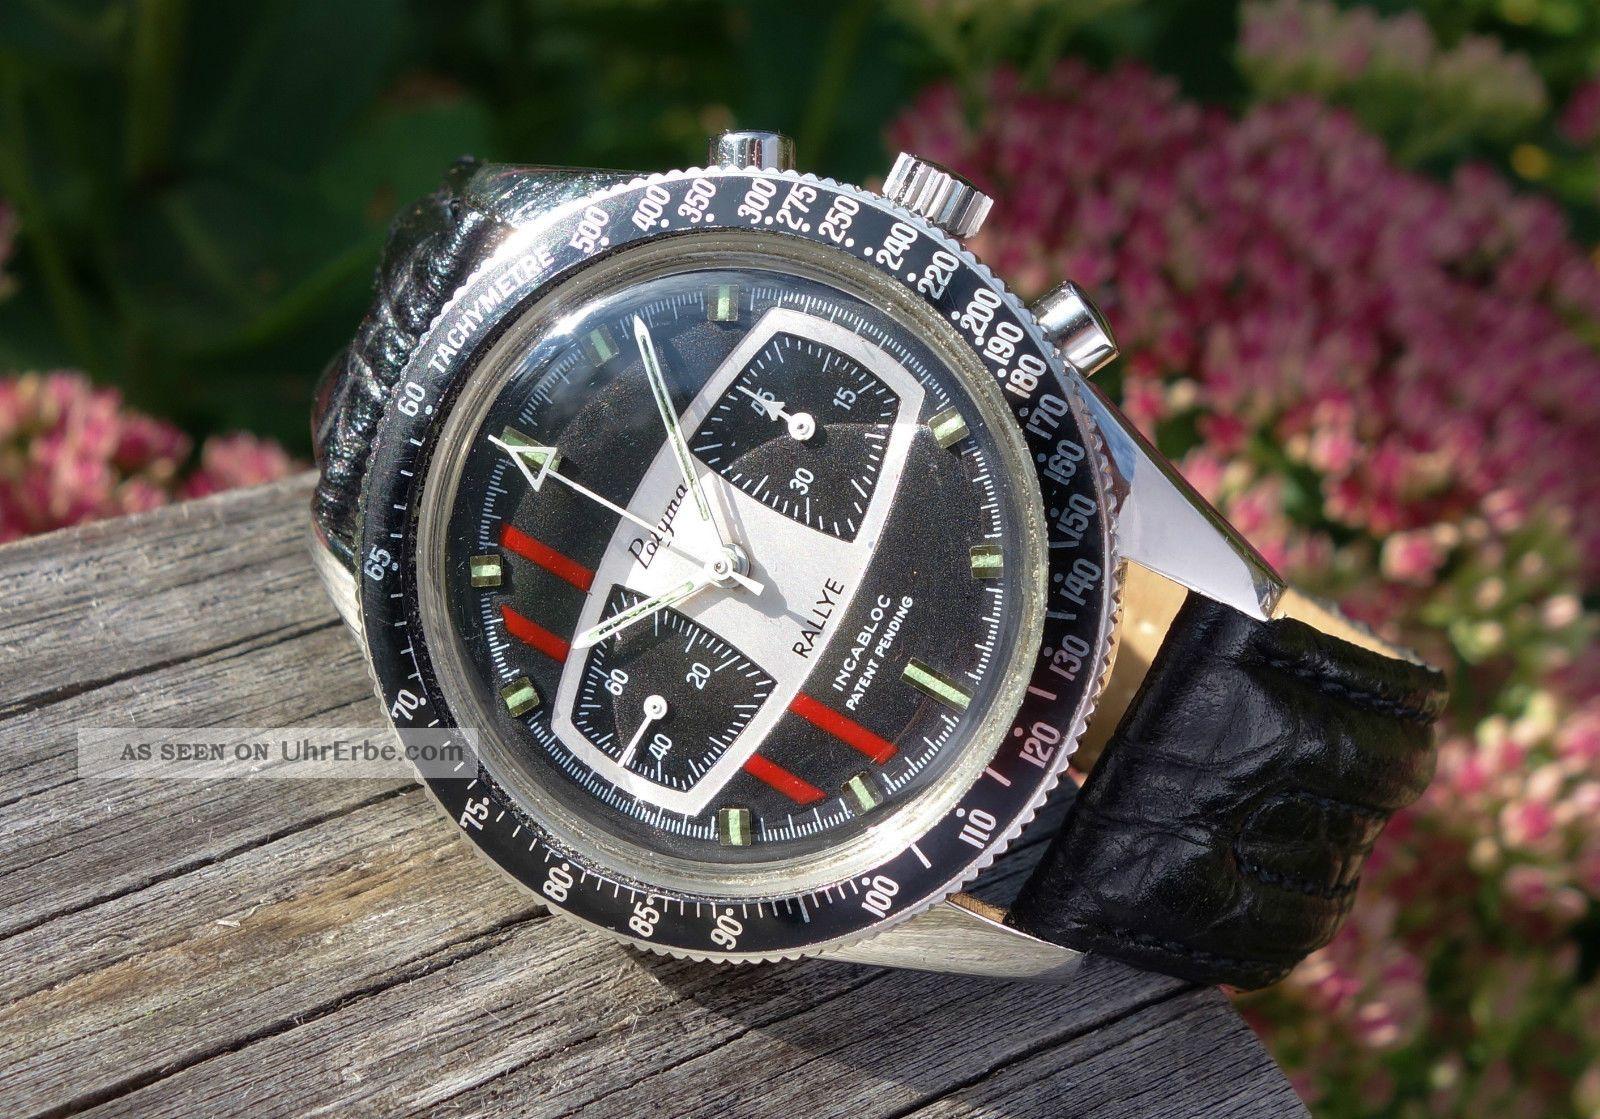 Polymac Yema Rallye Valjoux 7730 Chronograph,  Patent Pending Armbanduhren Bild